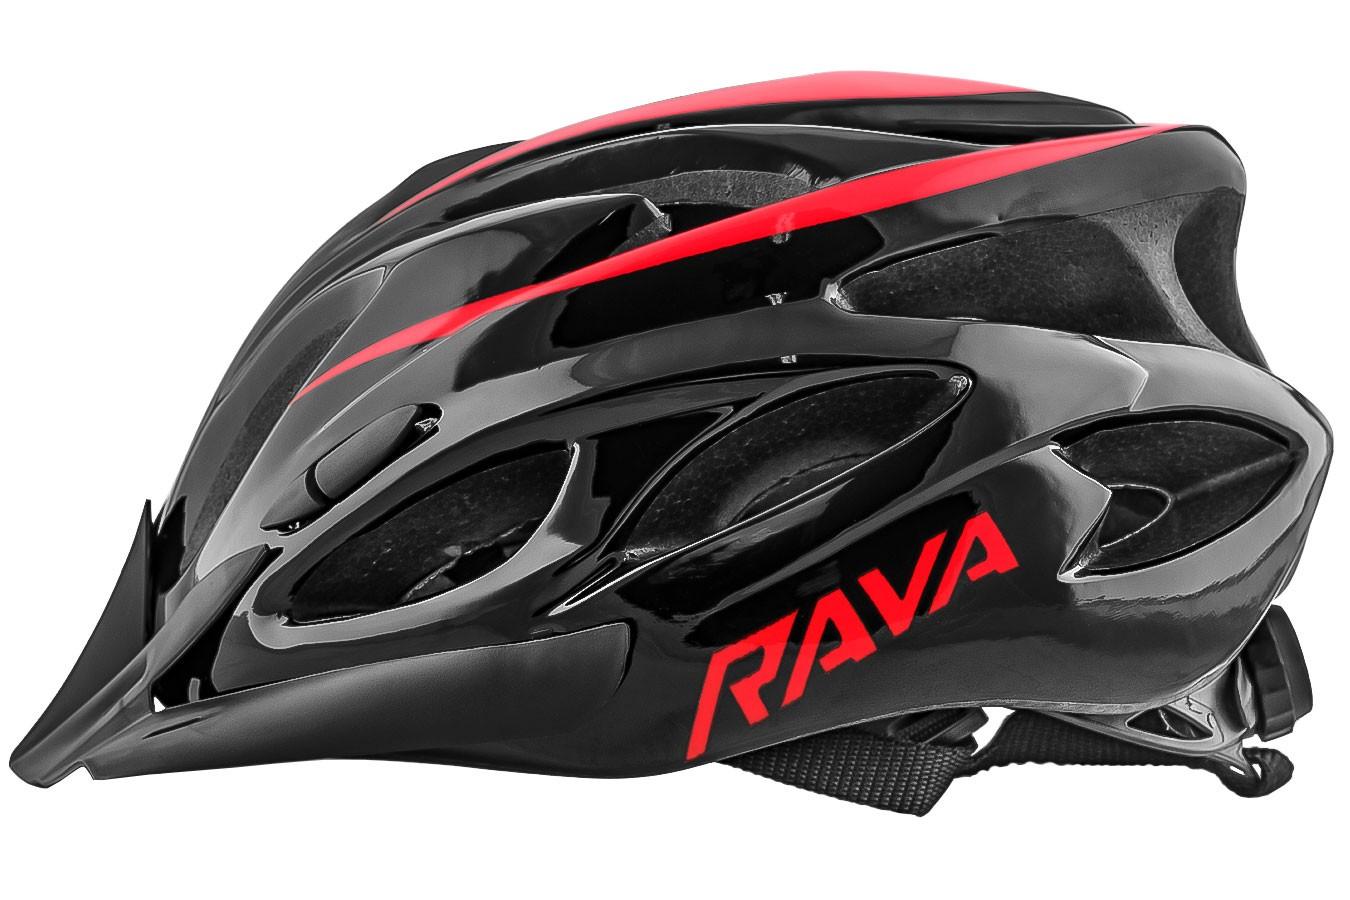 Capacete para Ciclista MTB Space New - Rava